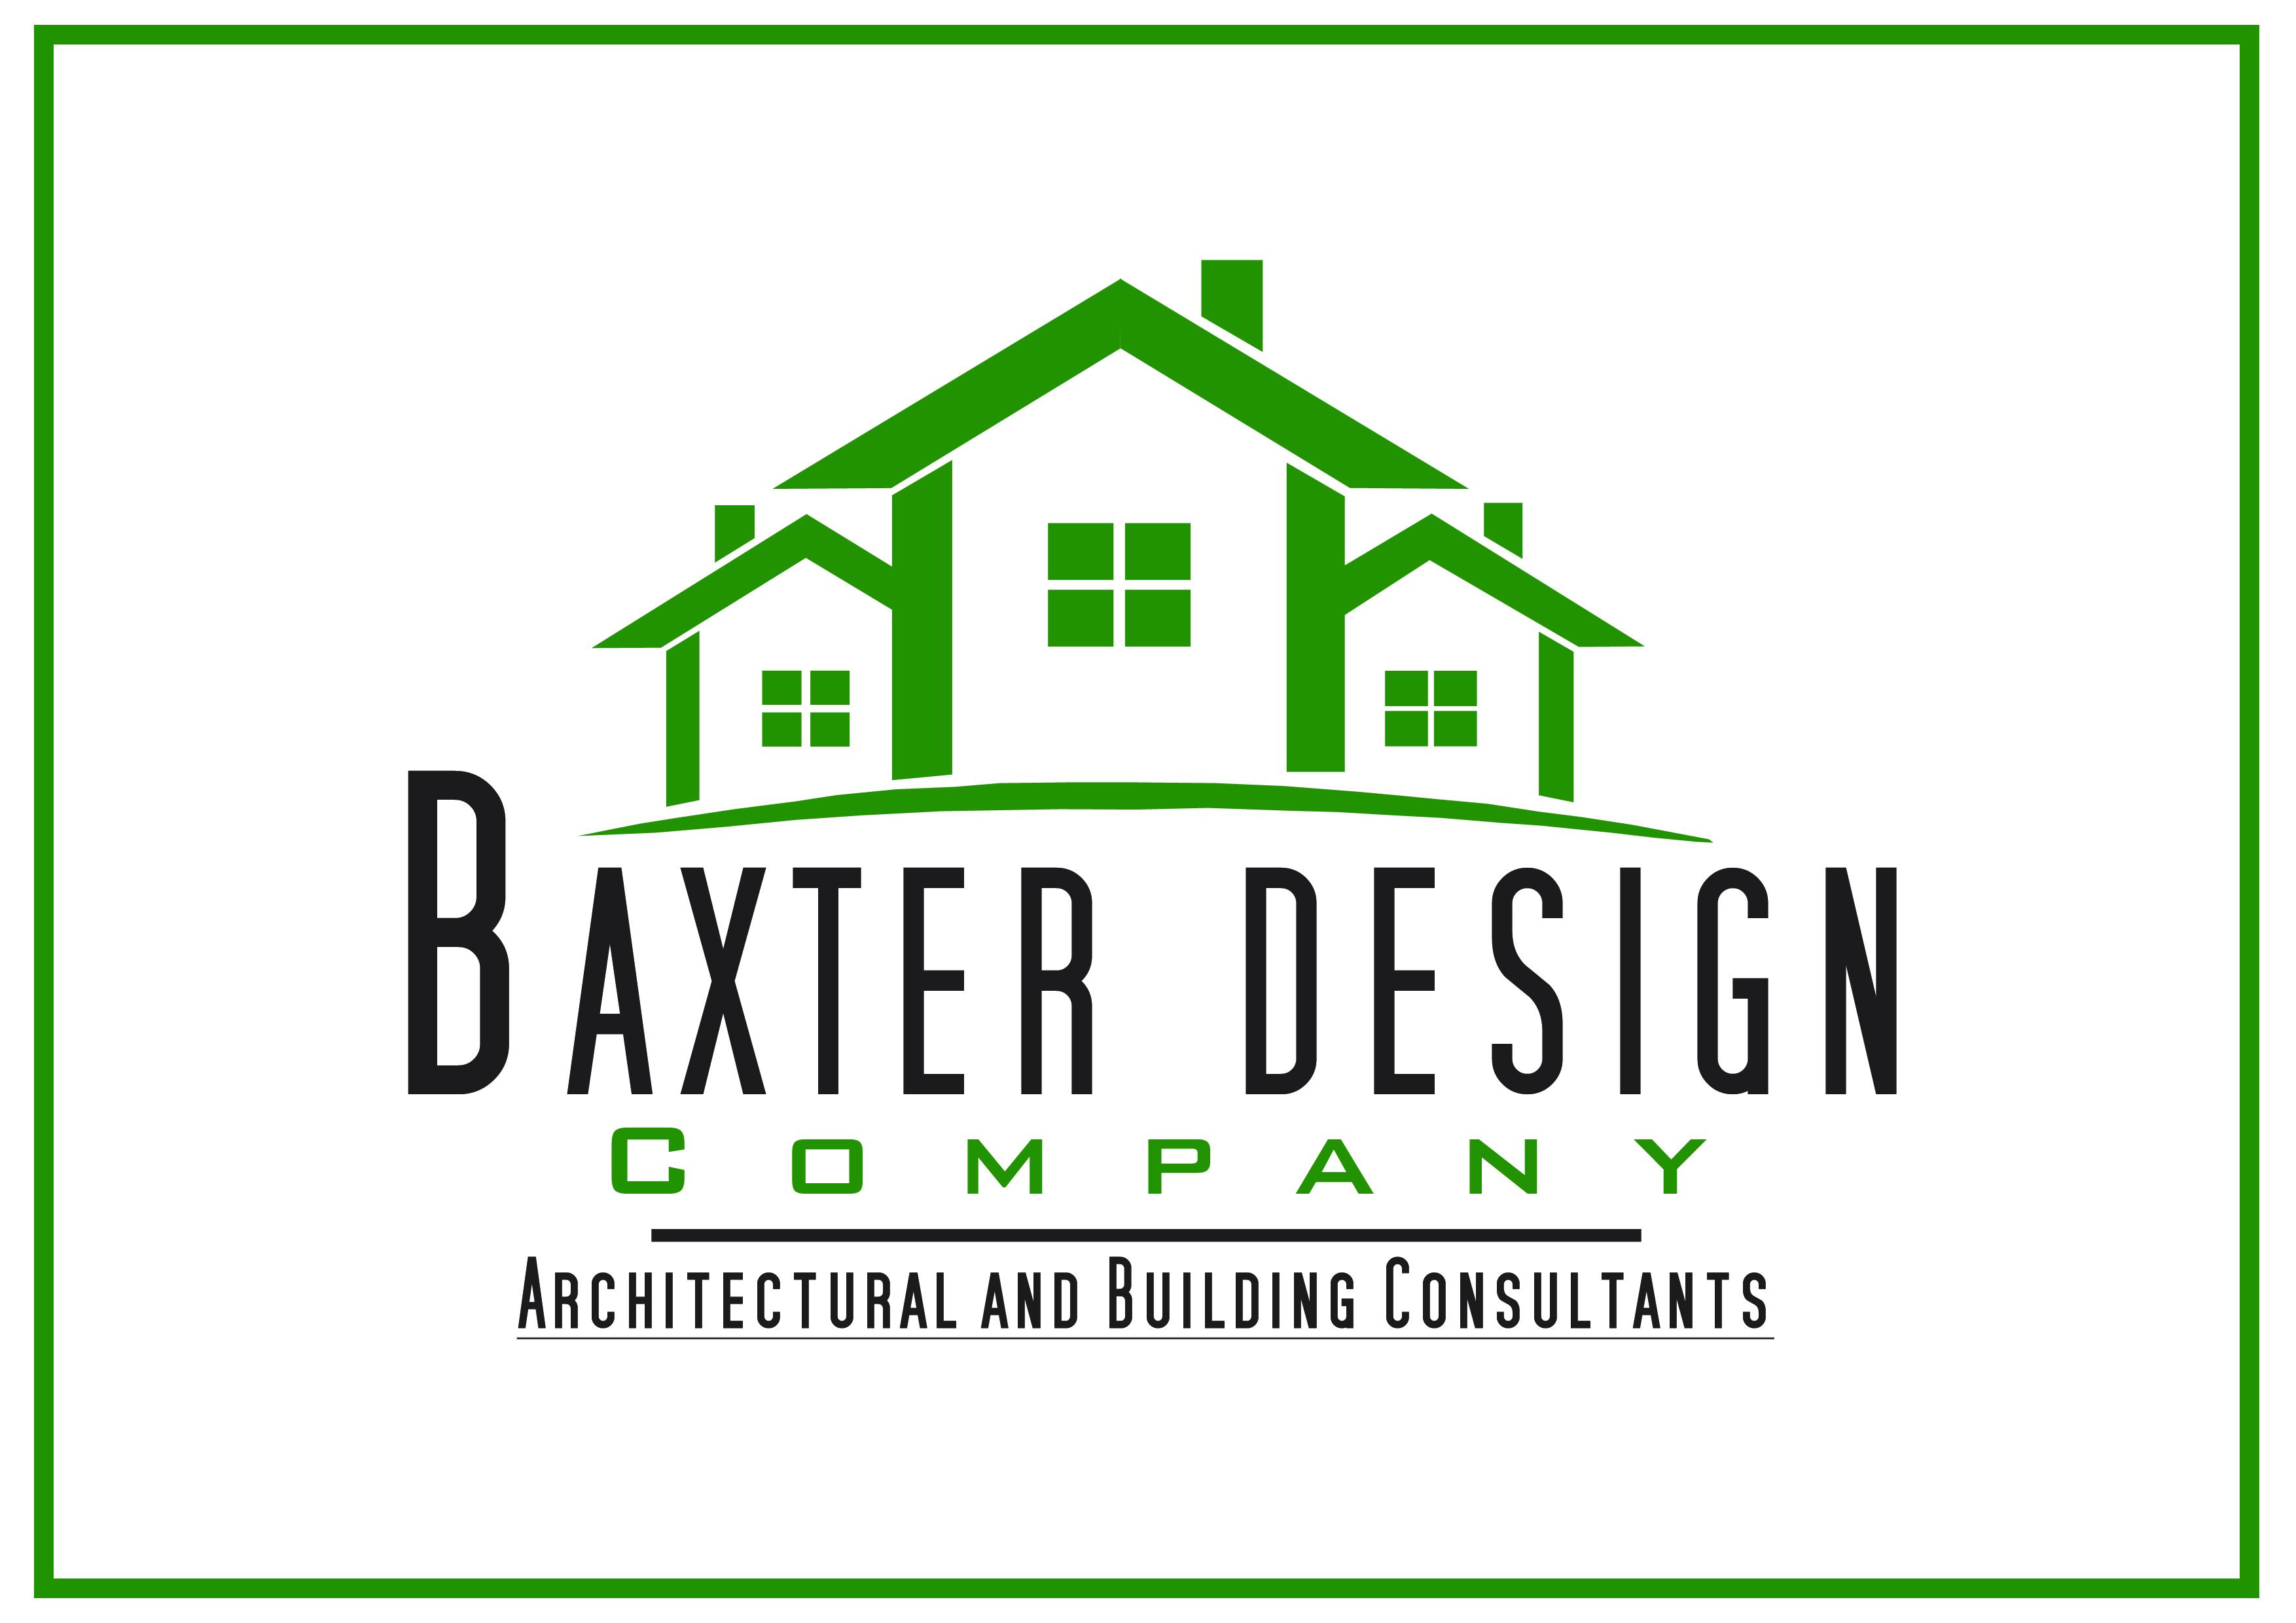 Baxter Design Company